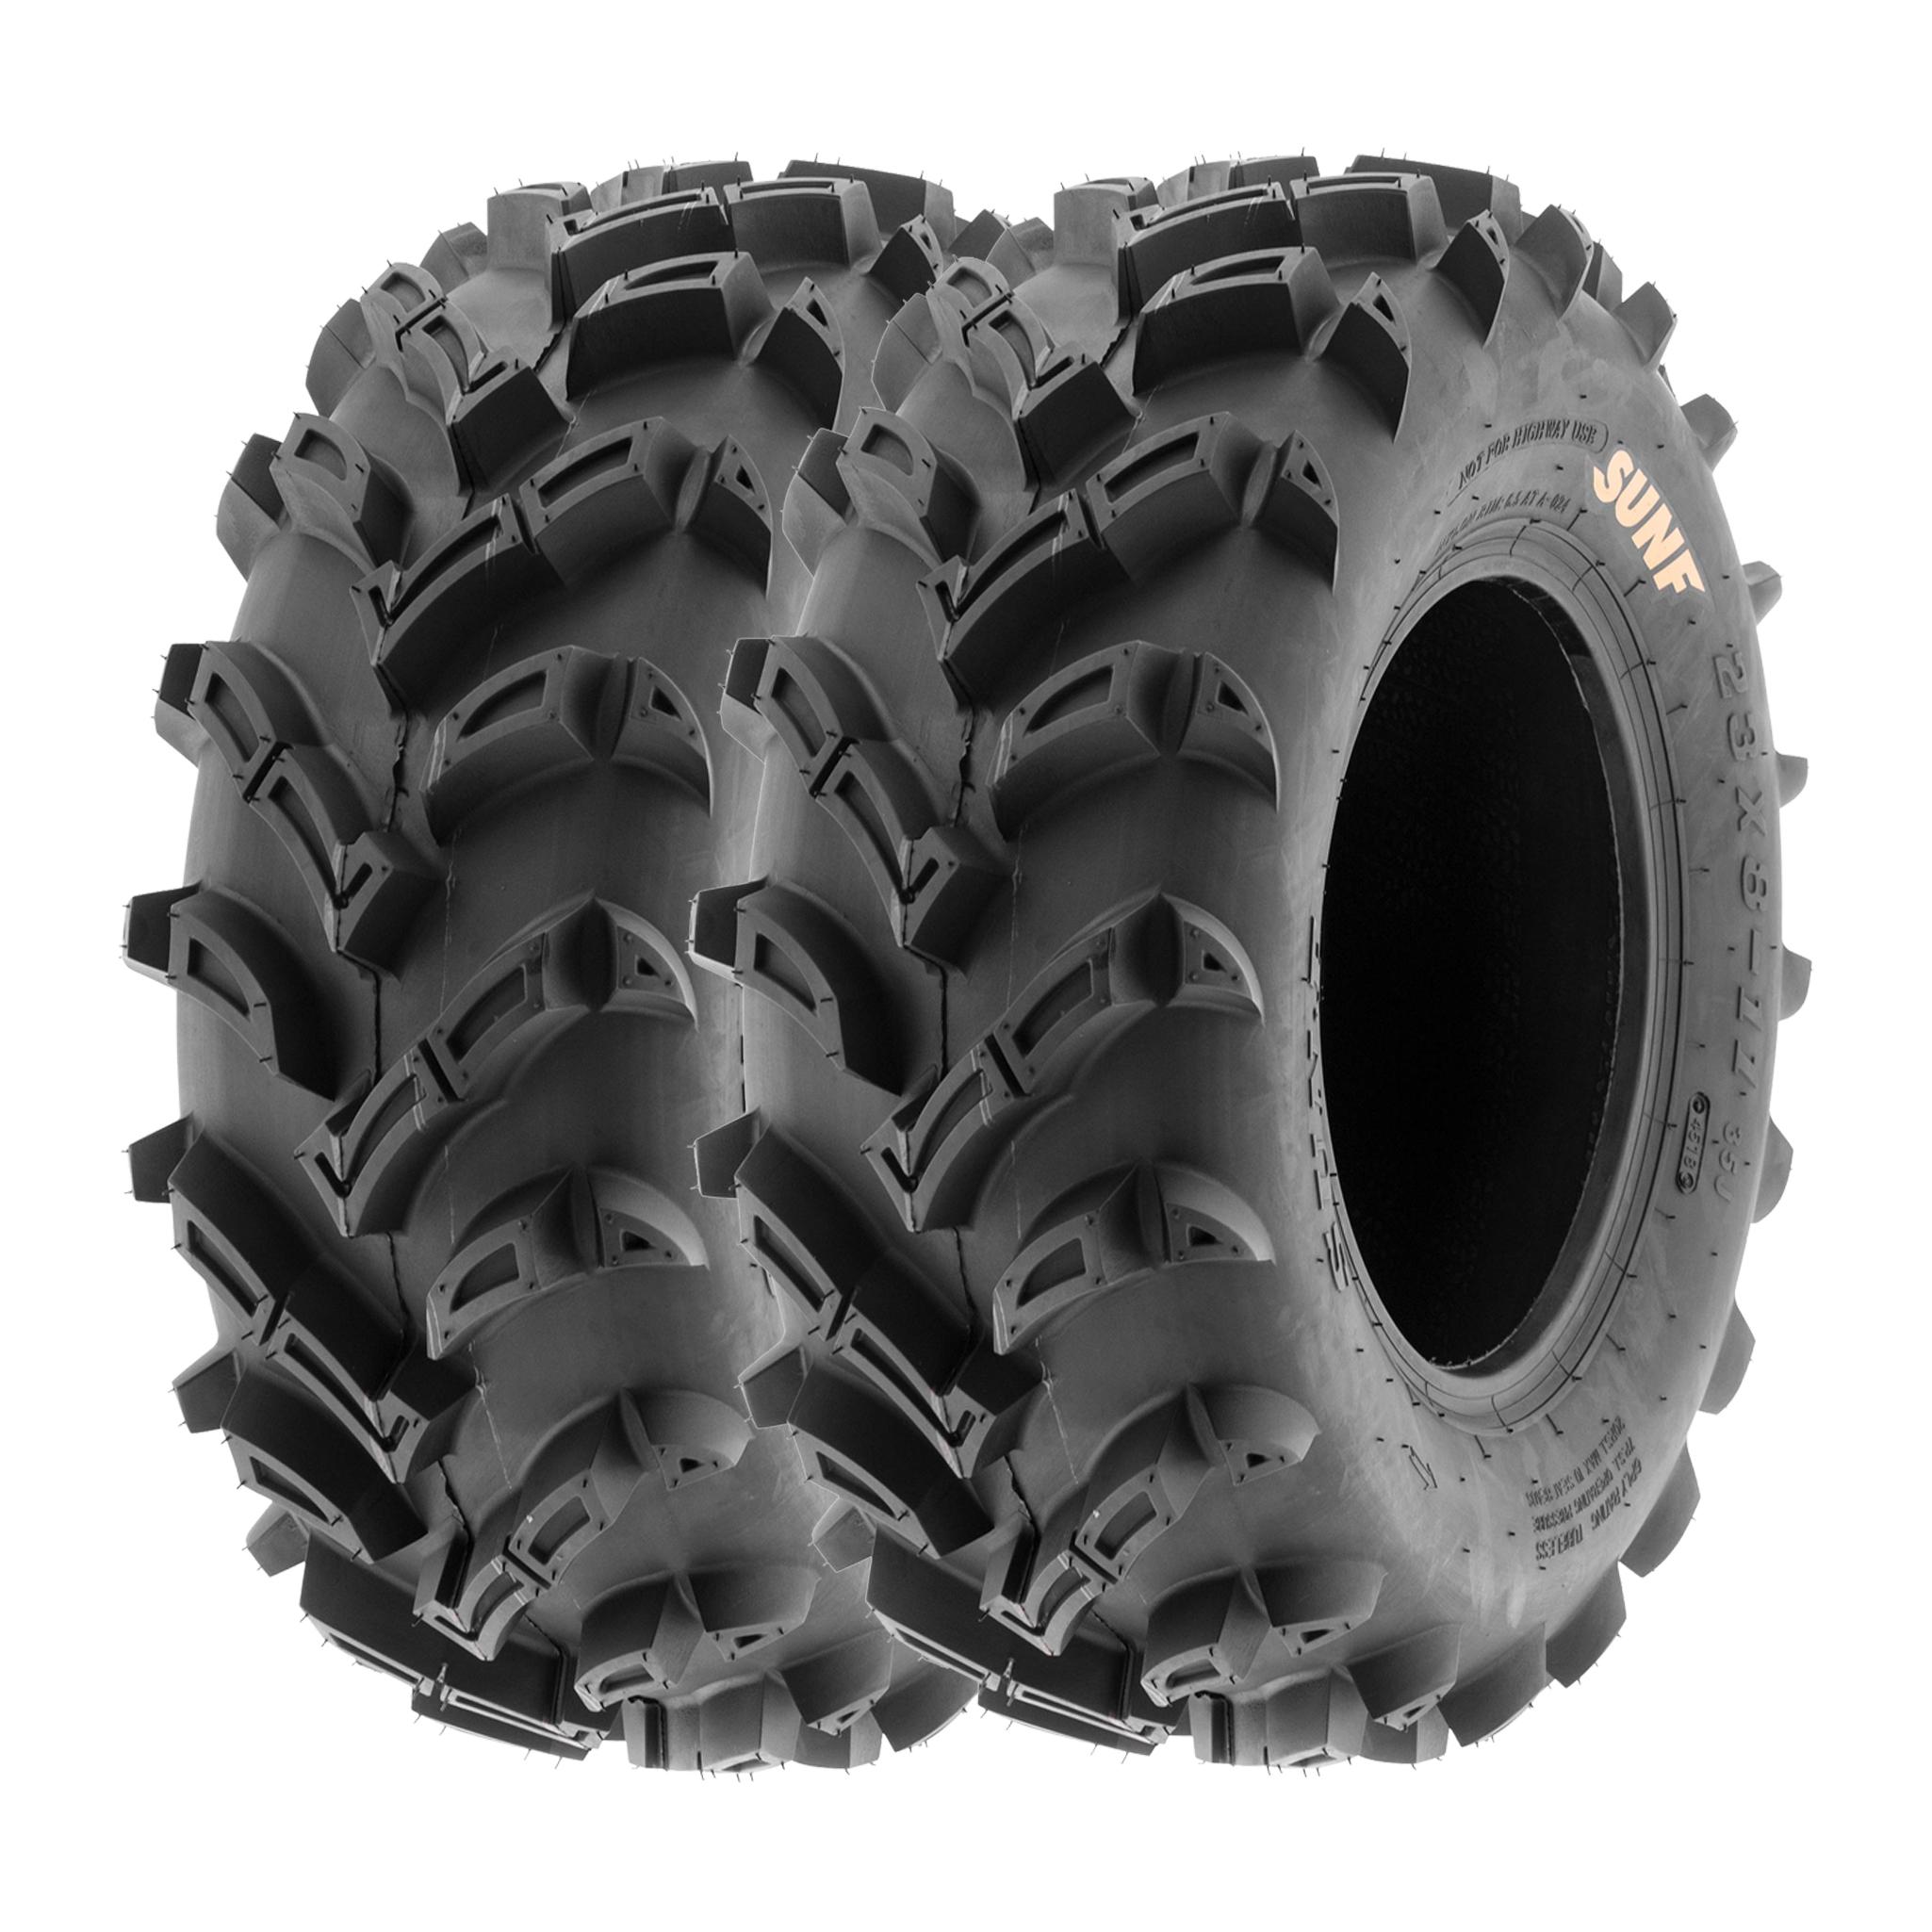 SUNROAD Set of 4 All Terrain ATV UTV Tires 25 25x8-12 Front /& 25x10-12 Rear 6PR Deep Mud Tubeless